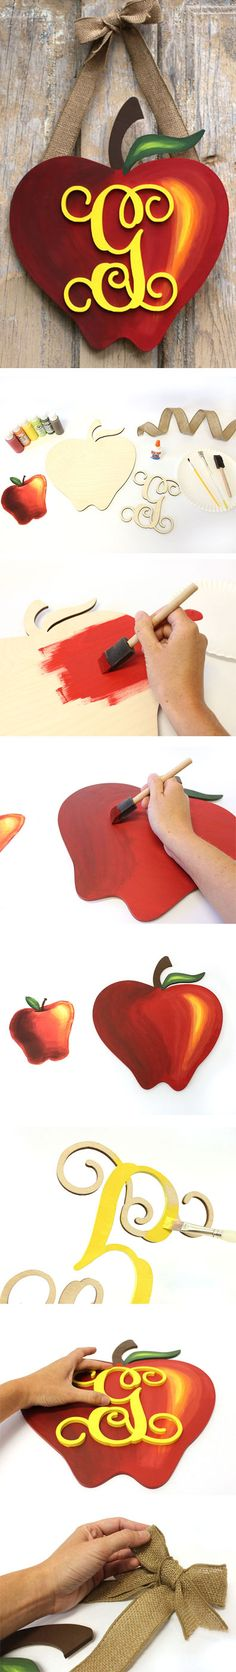 Apple Monogram Wreath | Back to School Wreath | CraftCuts.com